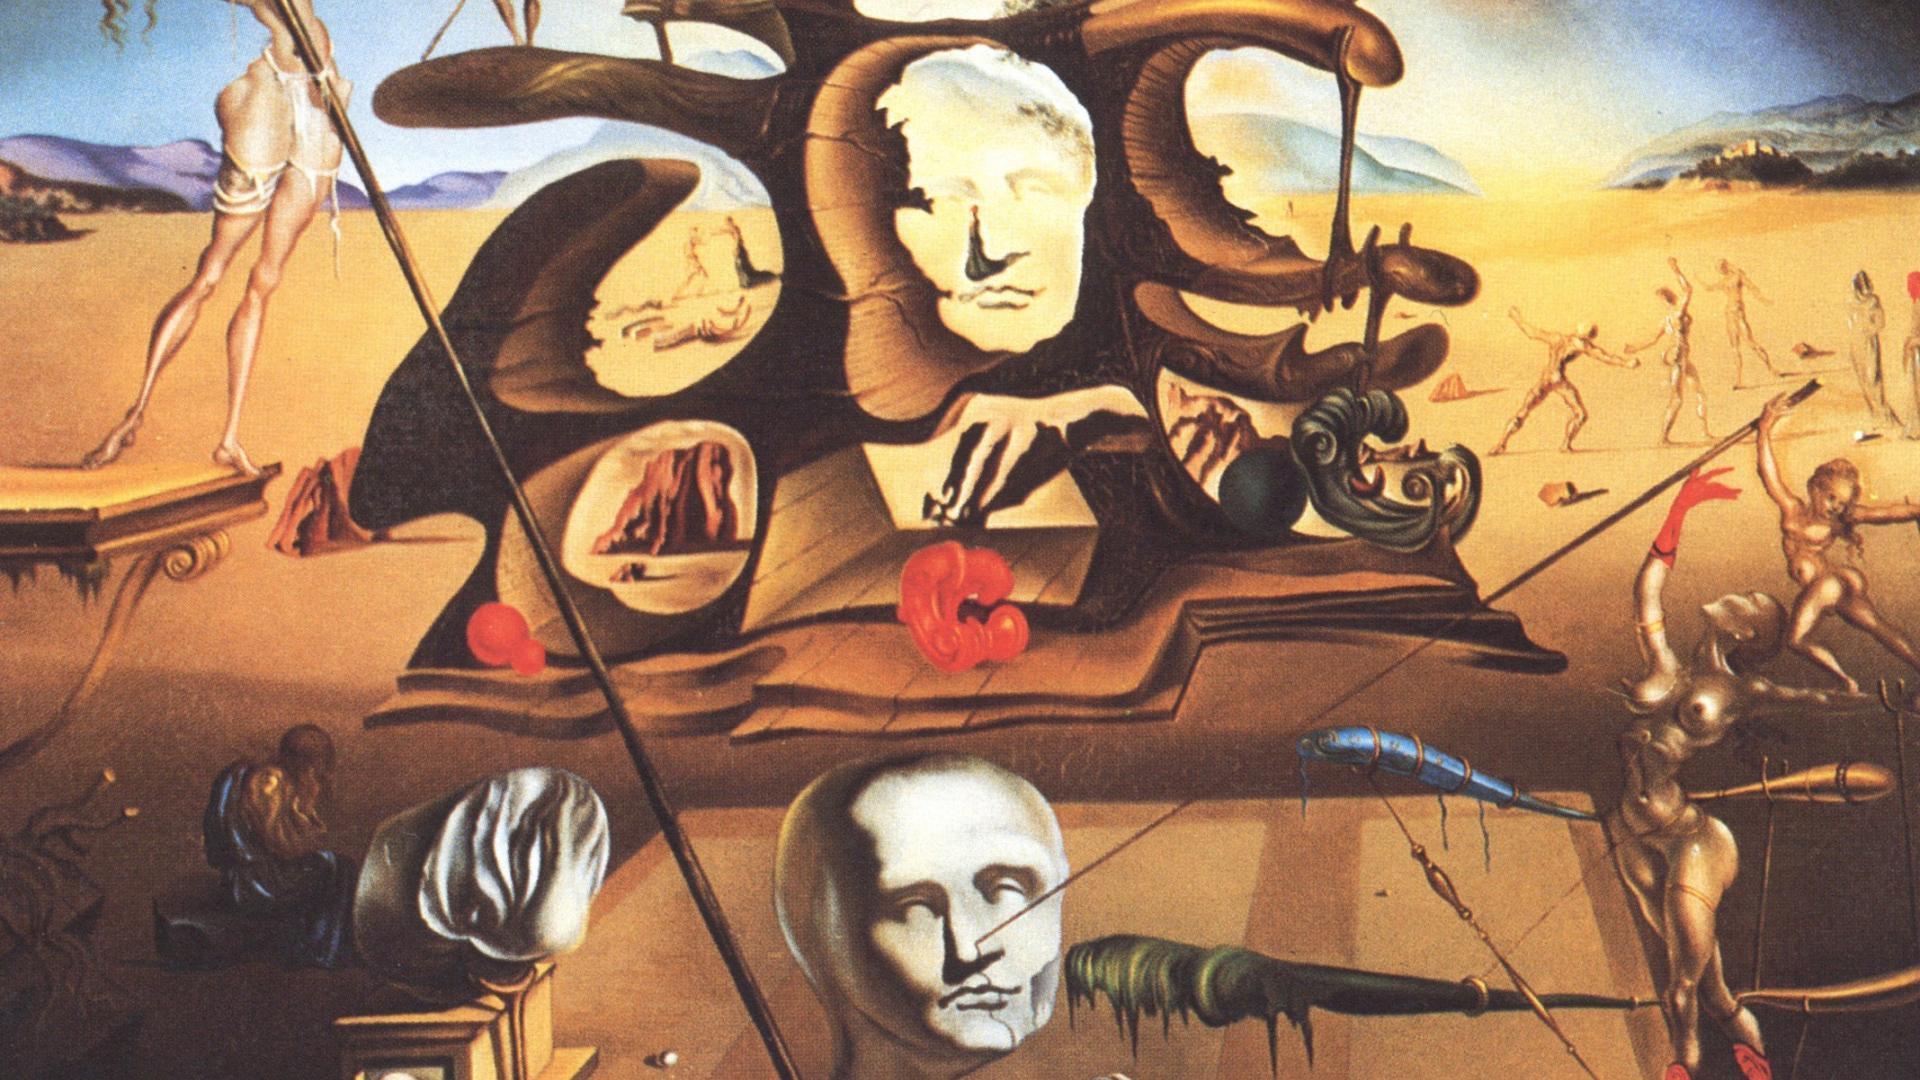 Dali Wallpapers Top Free Dali Backgrounds Wallpaperaccess